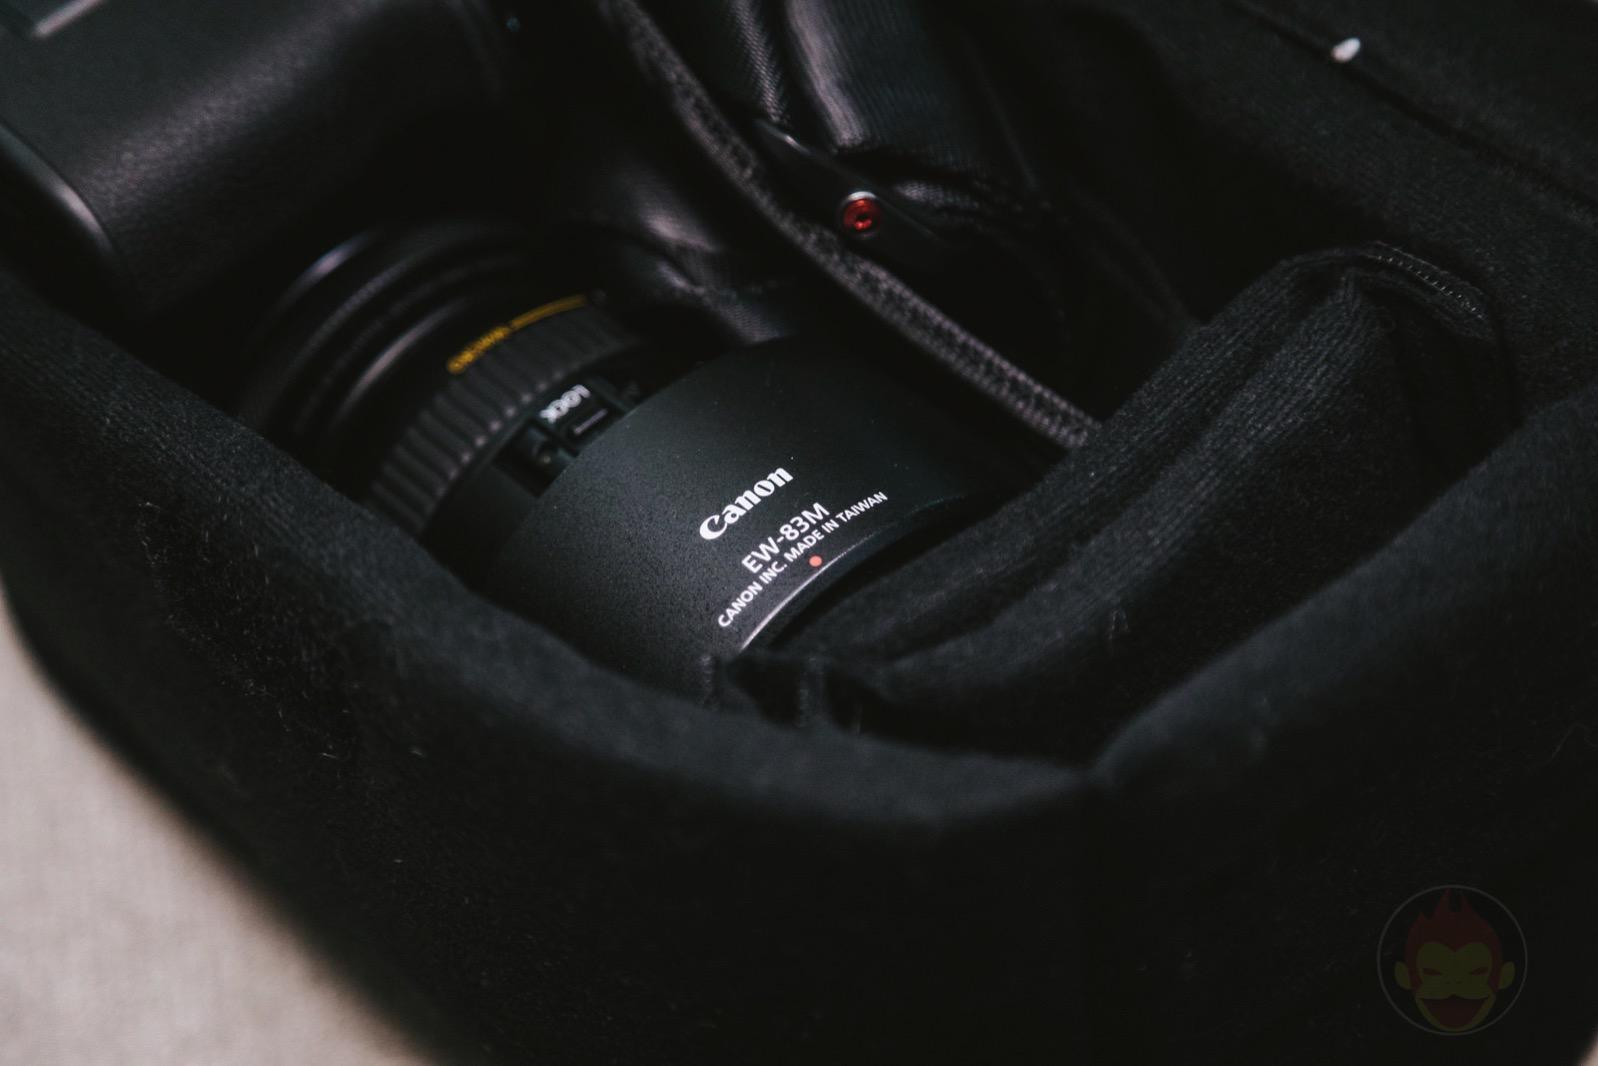 Hakuba-Camerabag-Innerbox-Review-03.jpg